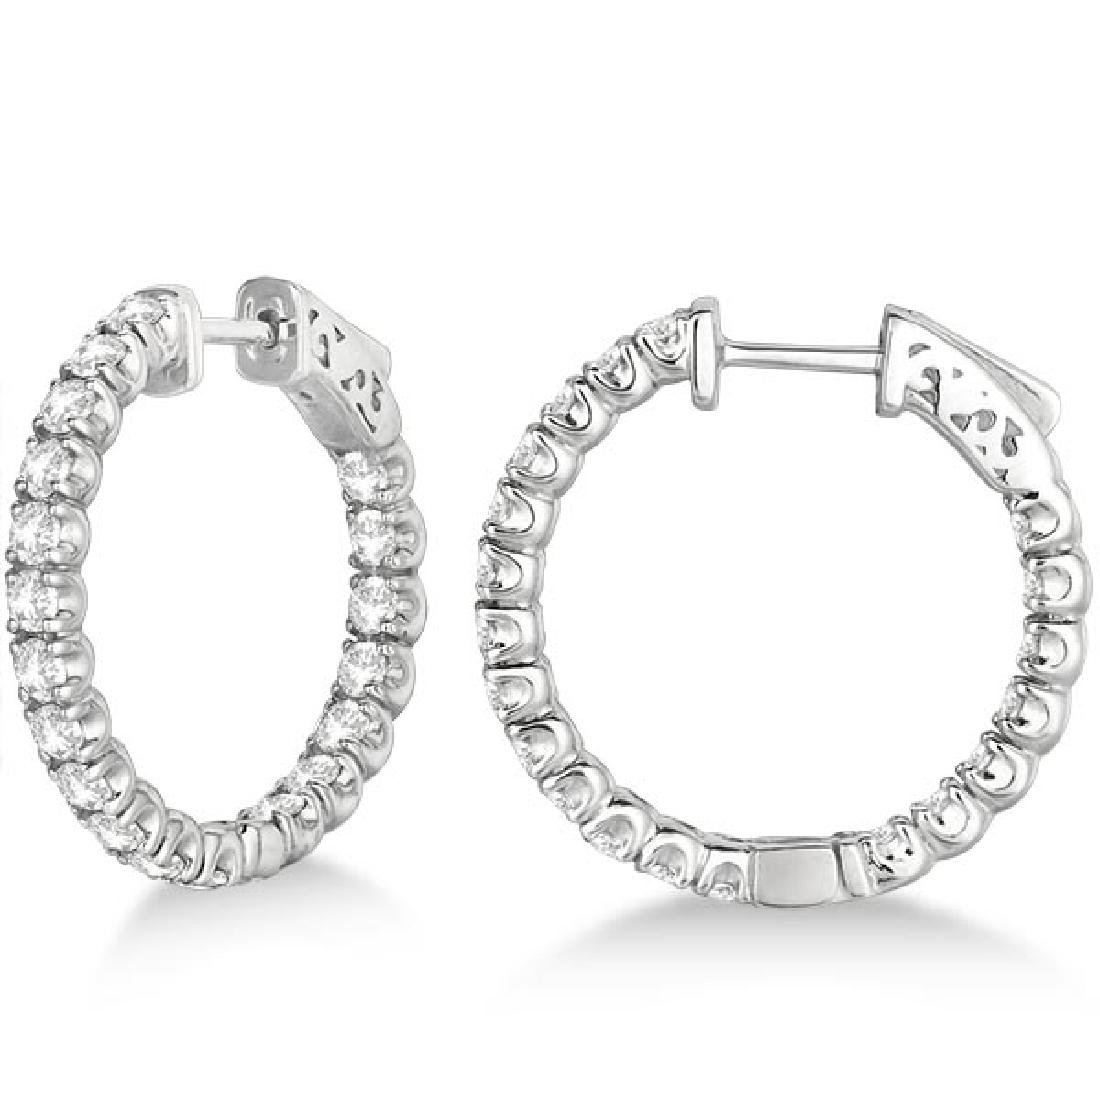 Small Fancy Round Diamond Hoop Earrings 14k White Gold